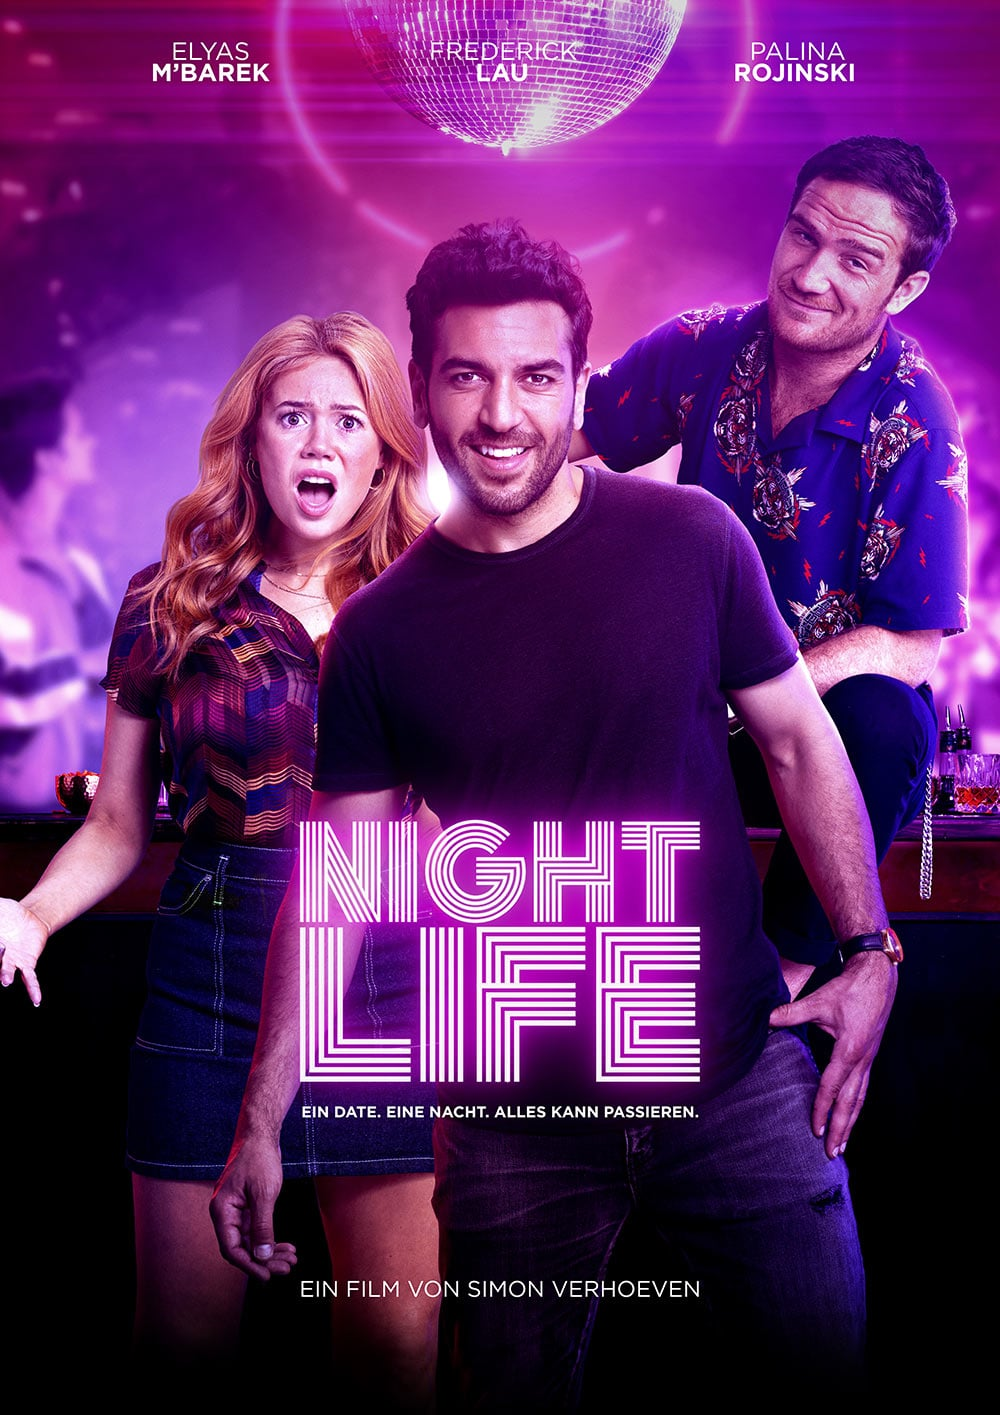 Nightlife Film - Alternative Artwork - Key Visual - 2